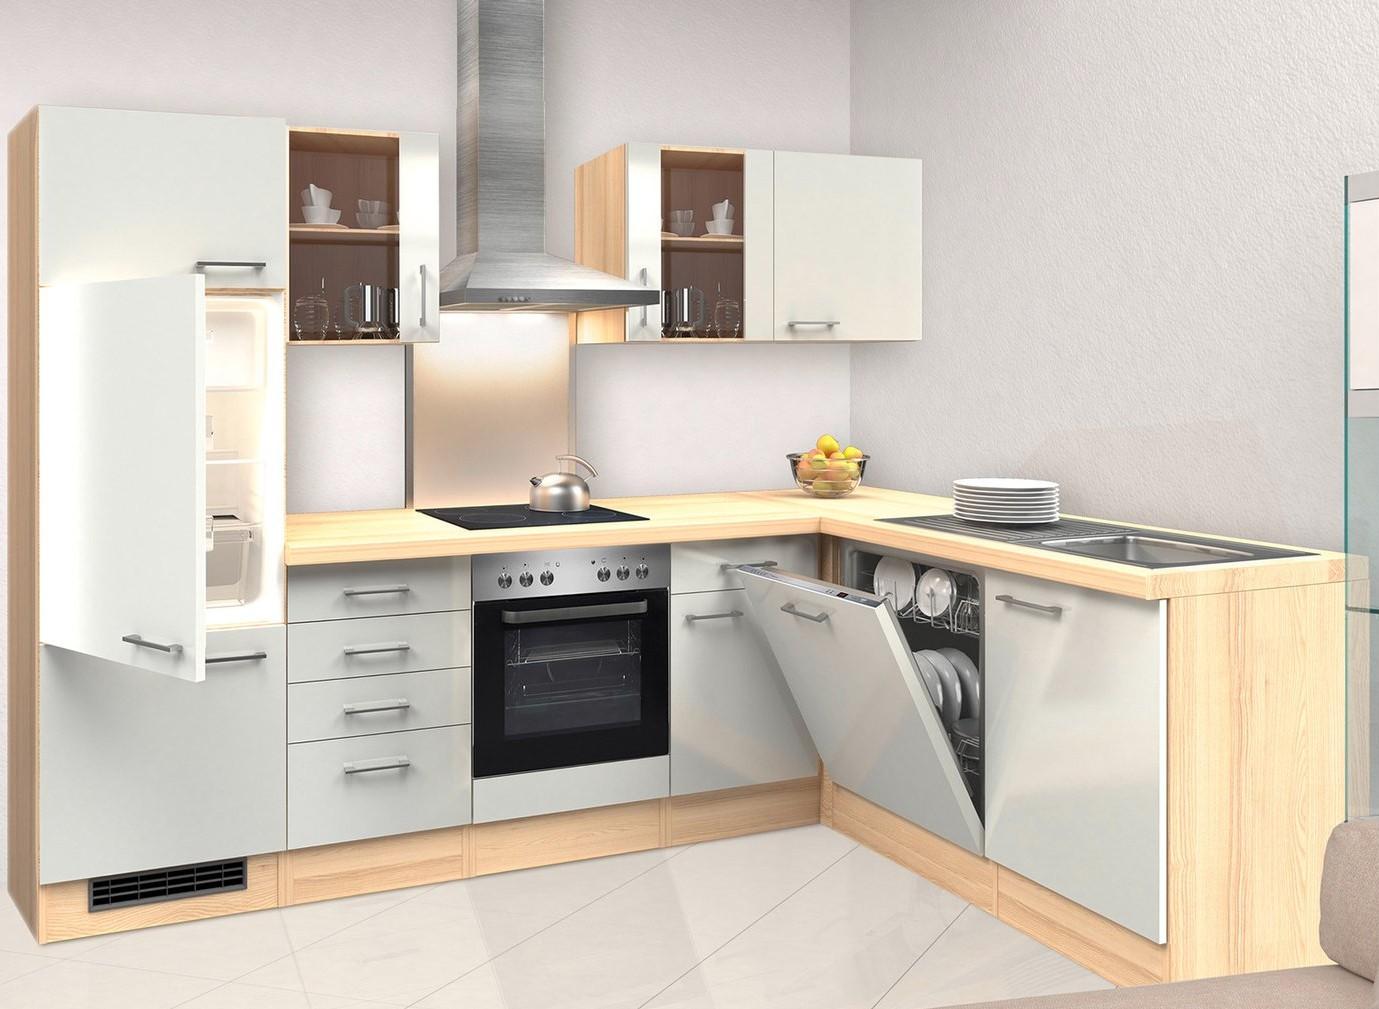 k chen h ngeschrank florenz k chenschrank oberschrank 2. Black Bedroom Furniture Sets. Home Design Ideas